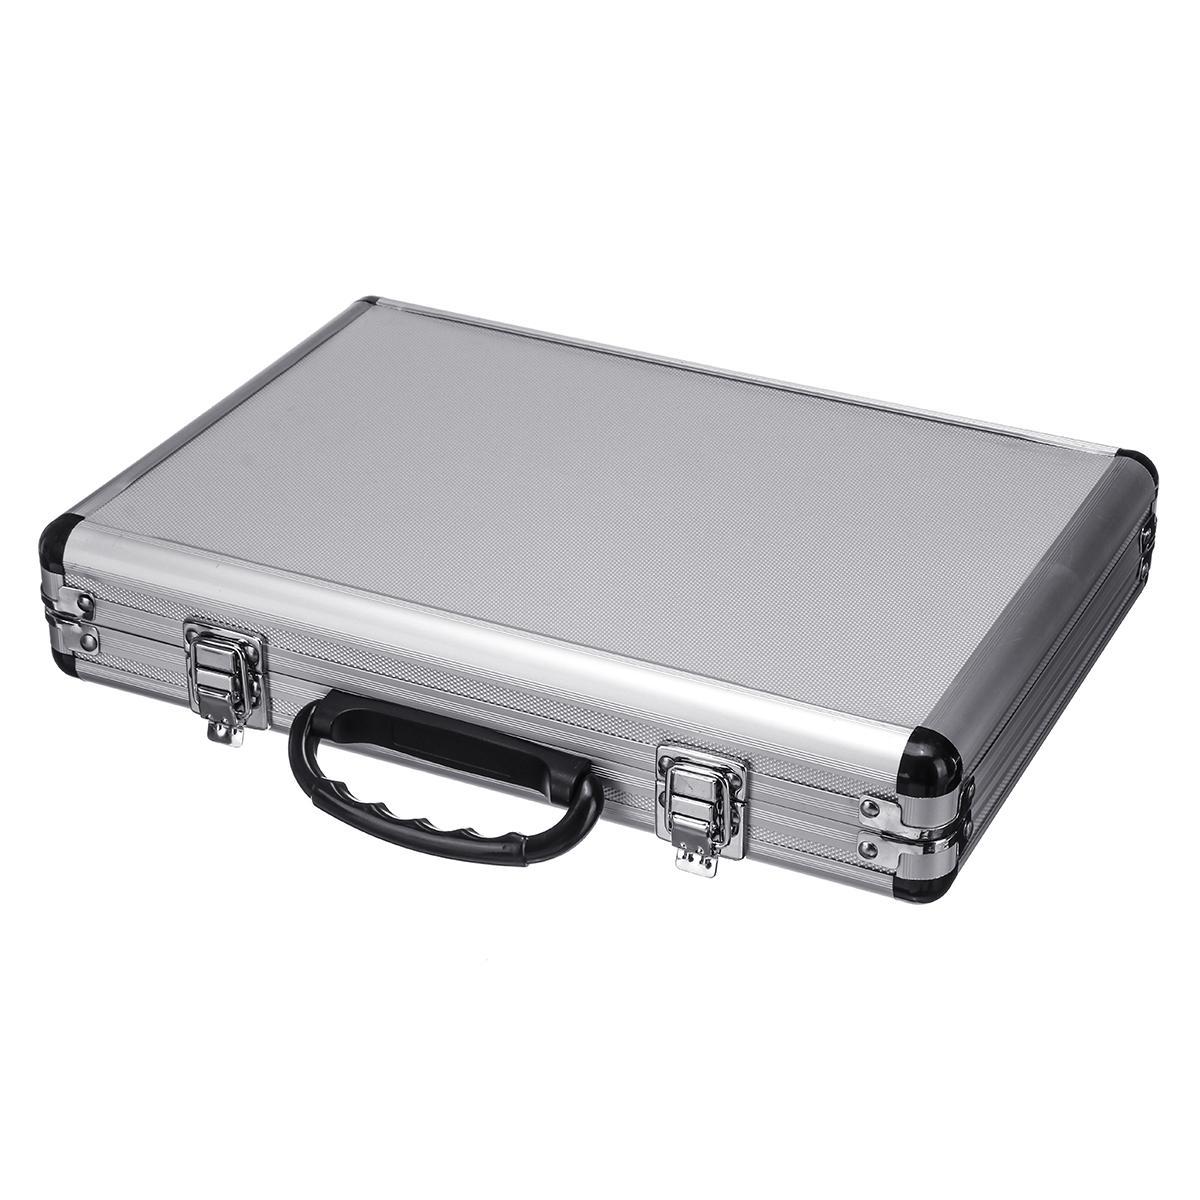 "Router Bit Set 35 Piece Kit w// 6.35mm 1//4/"" Shank and Aluminum Storage Case"